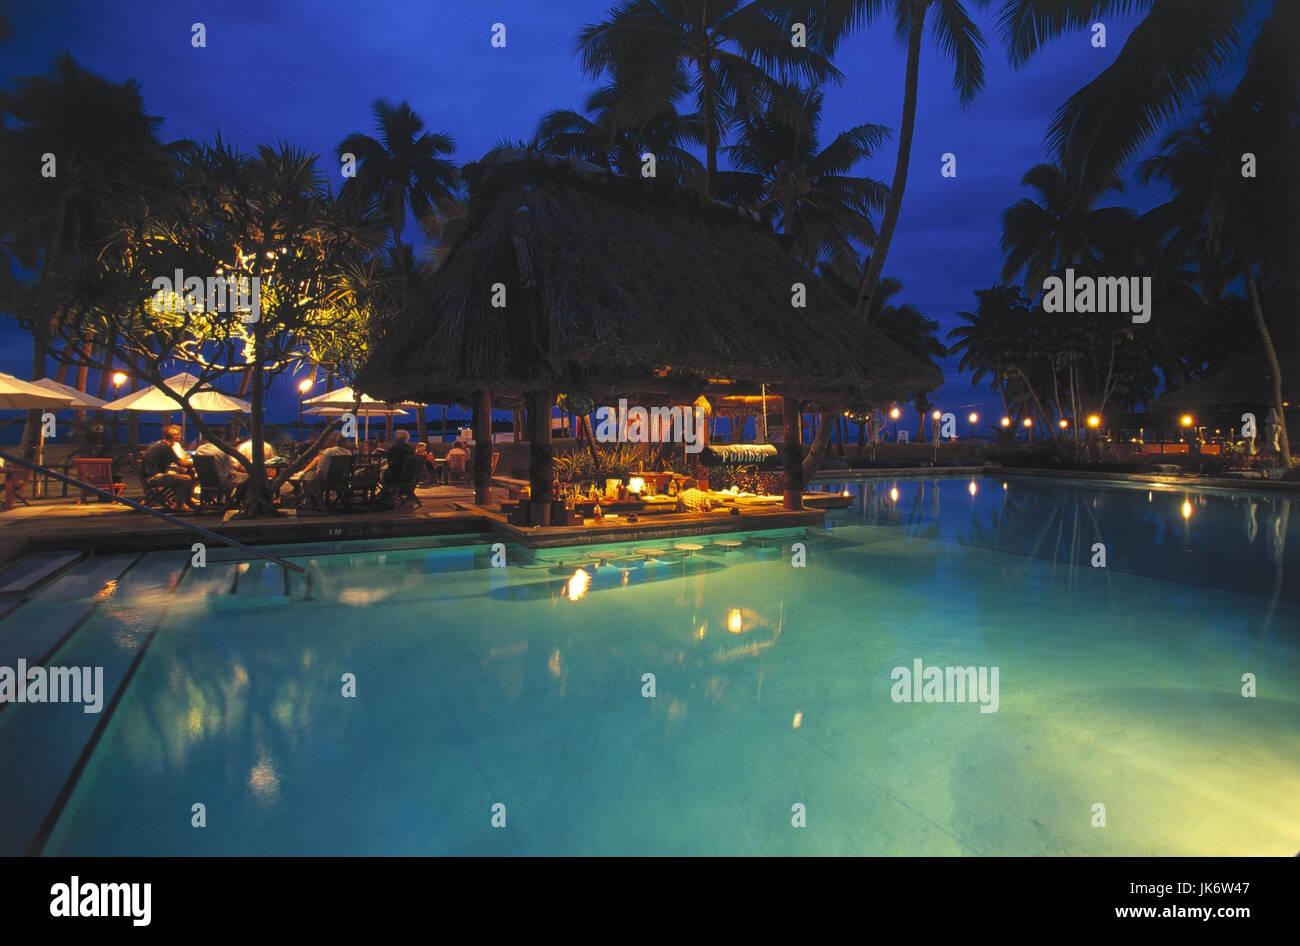 Fidschi-Inseln, Viti Levu, Insel Denarau, Sheraton Royal Denaurau Hotels, Pool, Restaurant-Terrasse, Abend Badefan, Stockbild